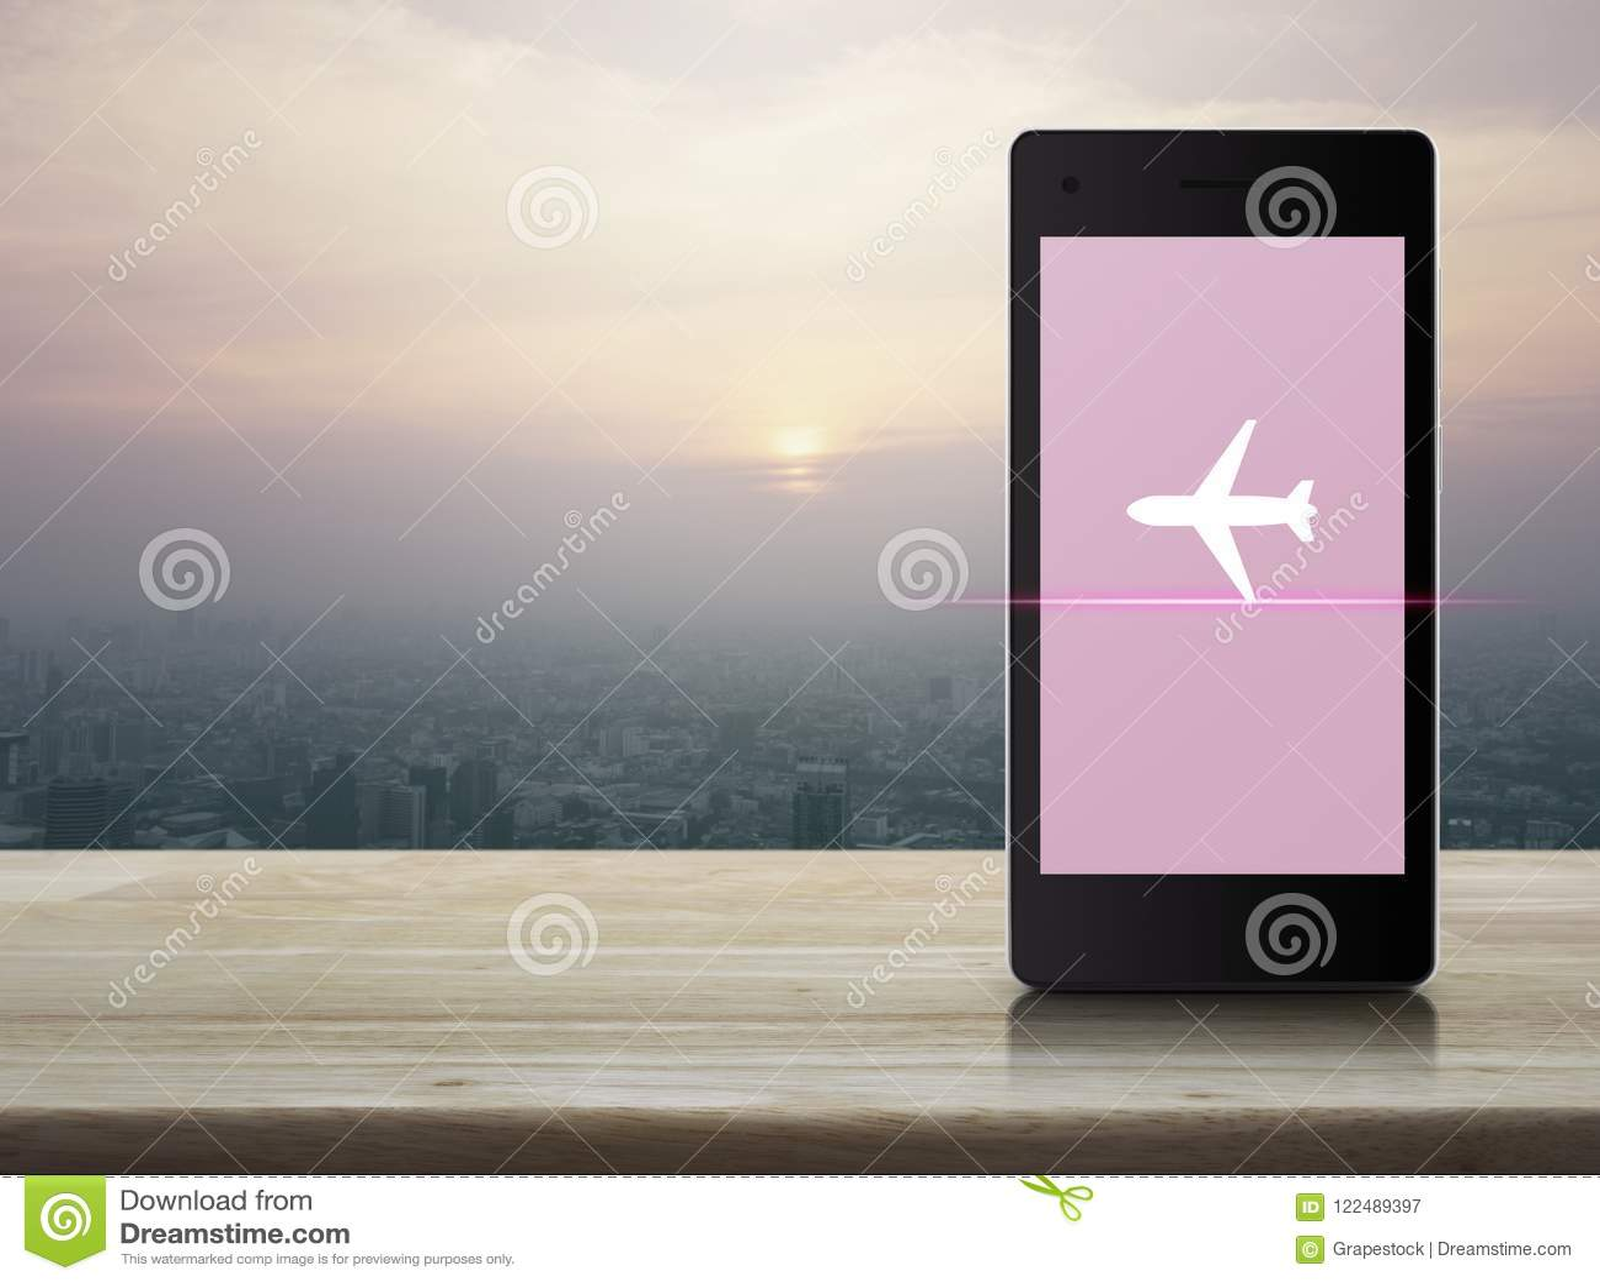 Business Airplane Transportation Concept Stock Illustration